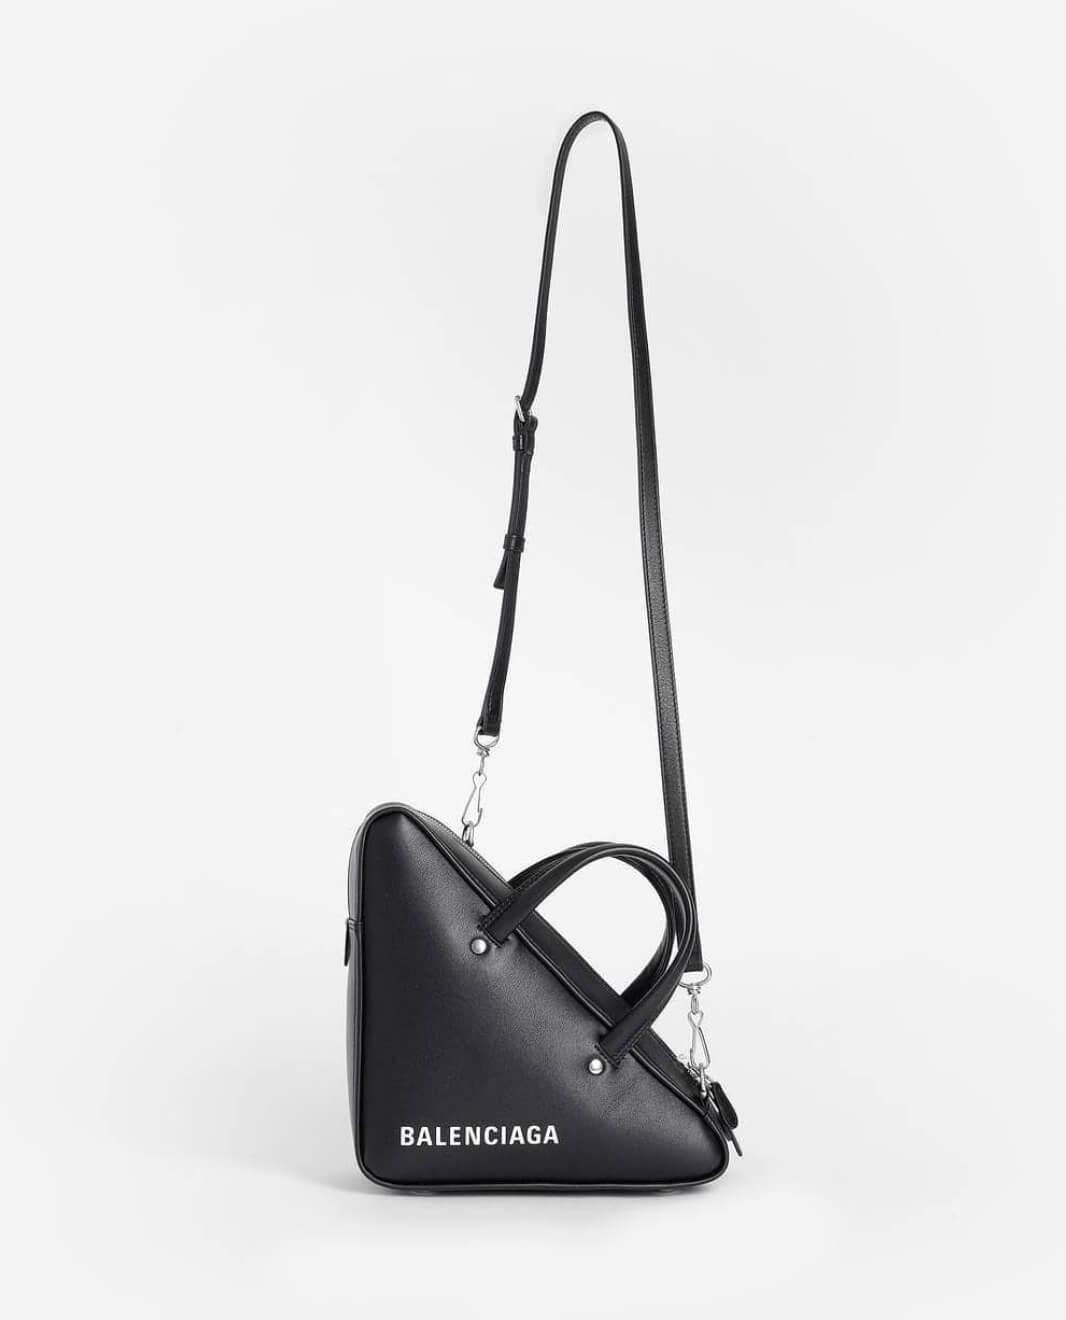 balenciaga triangle bag black shoulder strap view